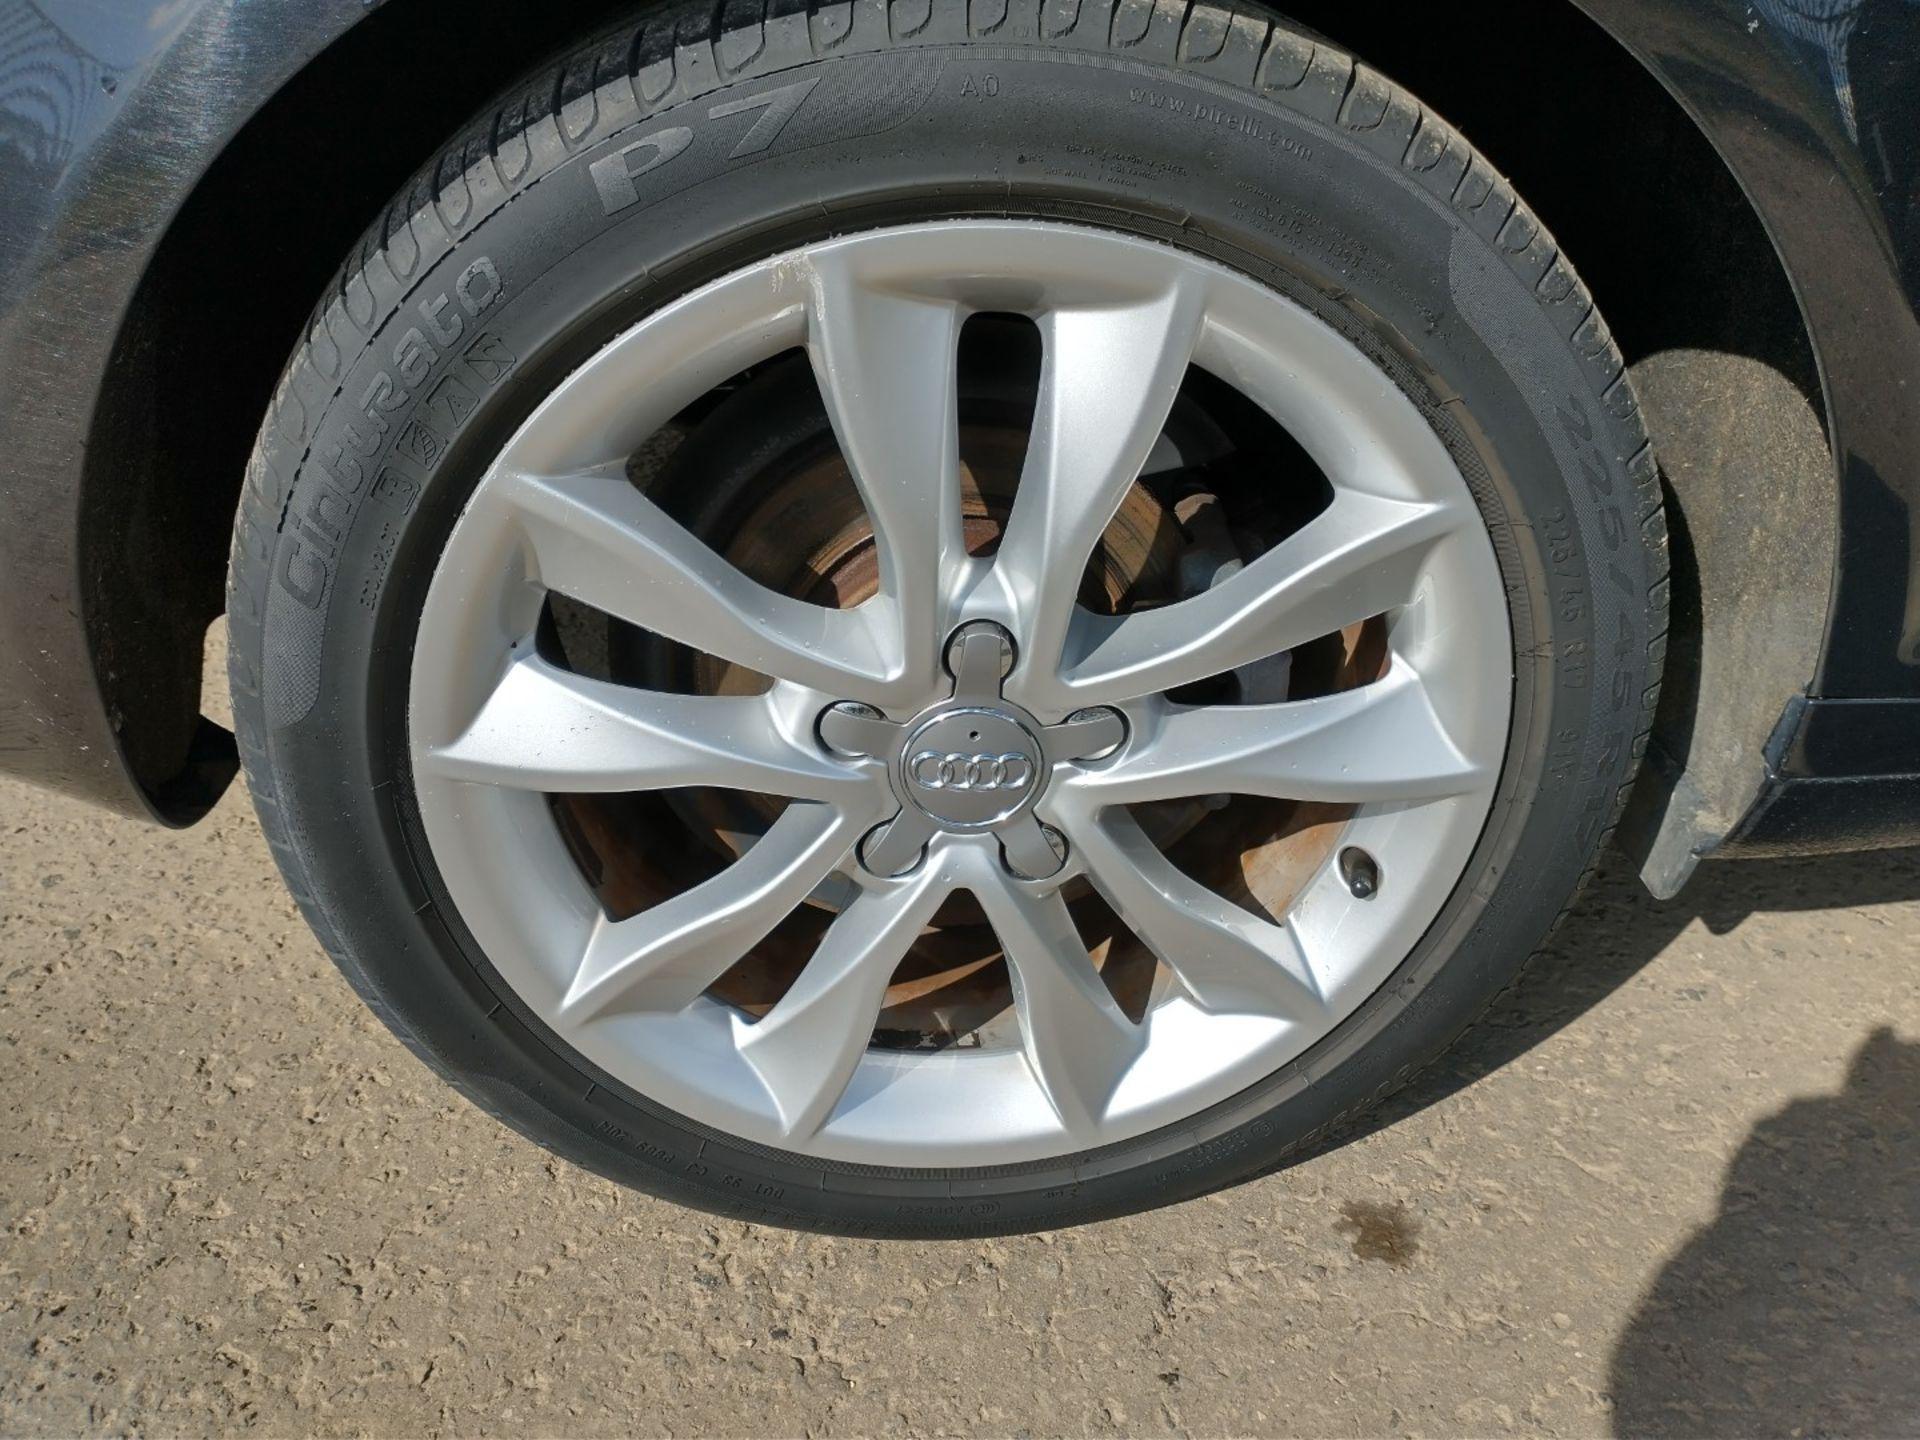 2012 Audi A3 Sportback 1.6 Tdi Hatchback - Full Service History - CL505 - NO VAT ON THE HAMMER - - Image 19 of 26